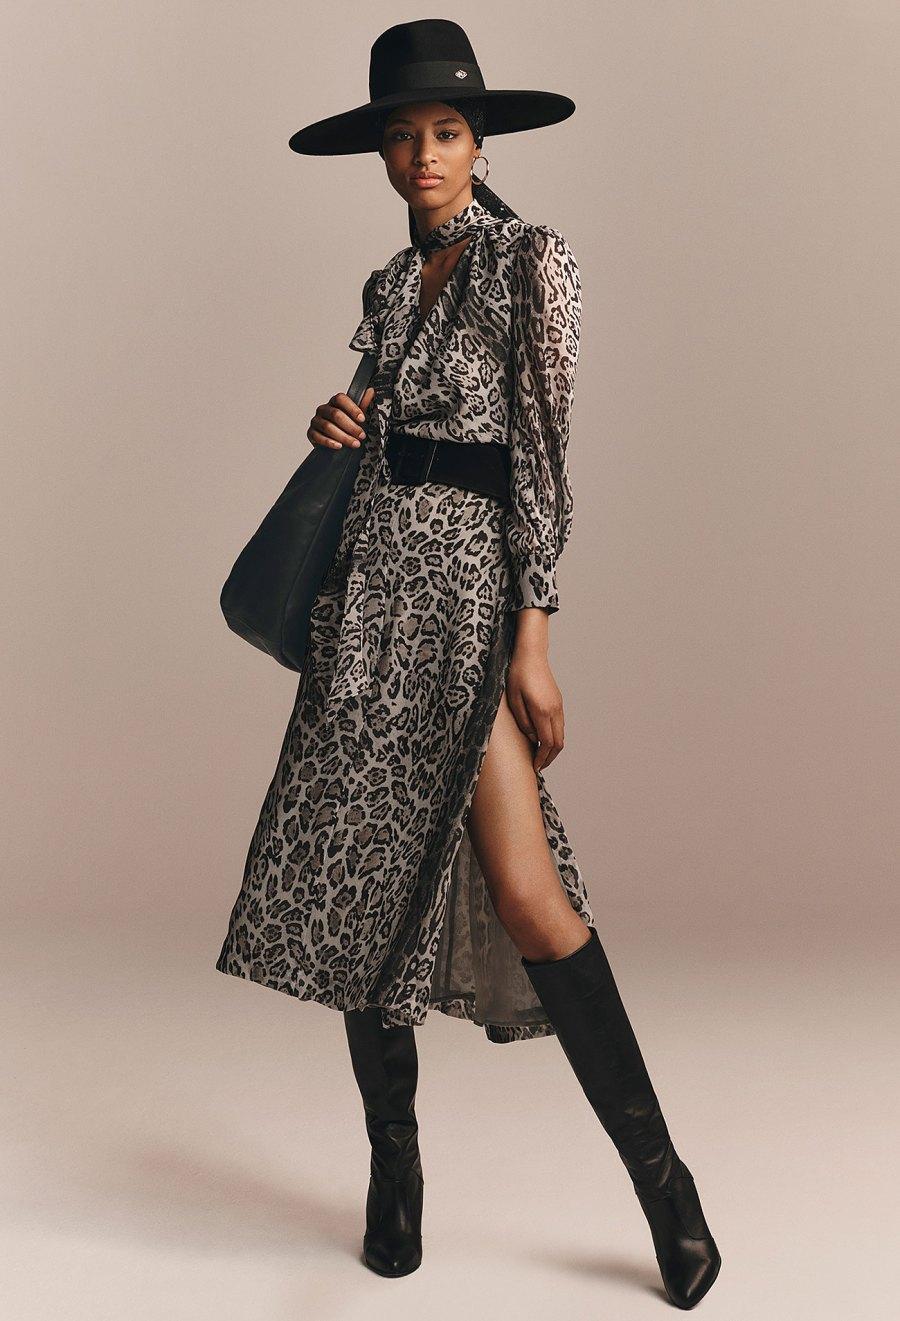 Zendaya x Tommy Hilfiger Collection - Zendaya Snow Leopard Print Dress